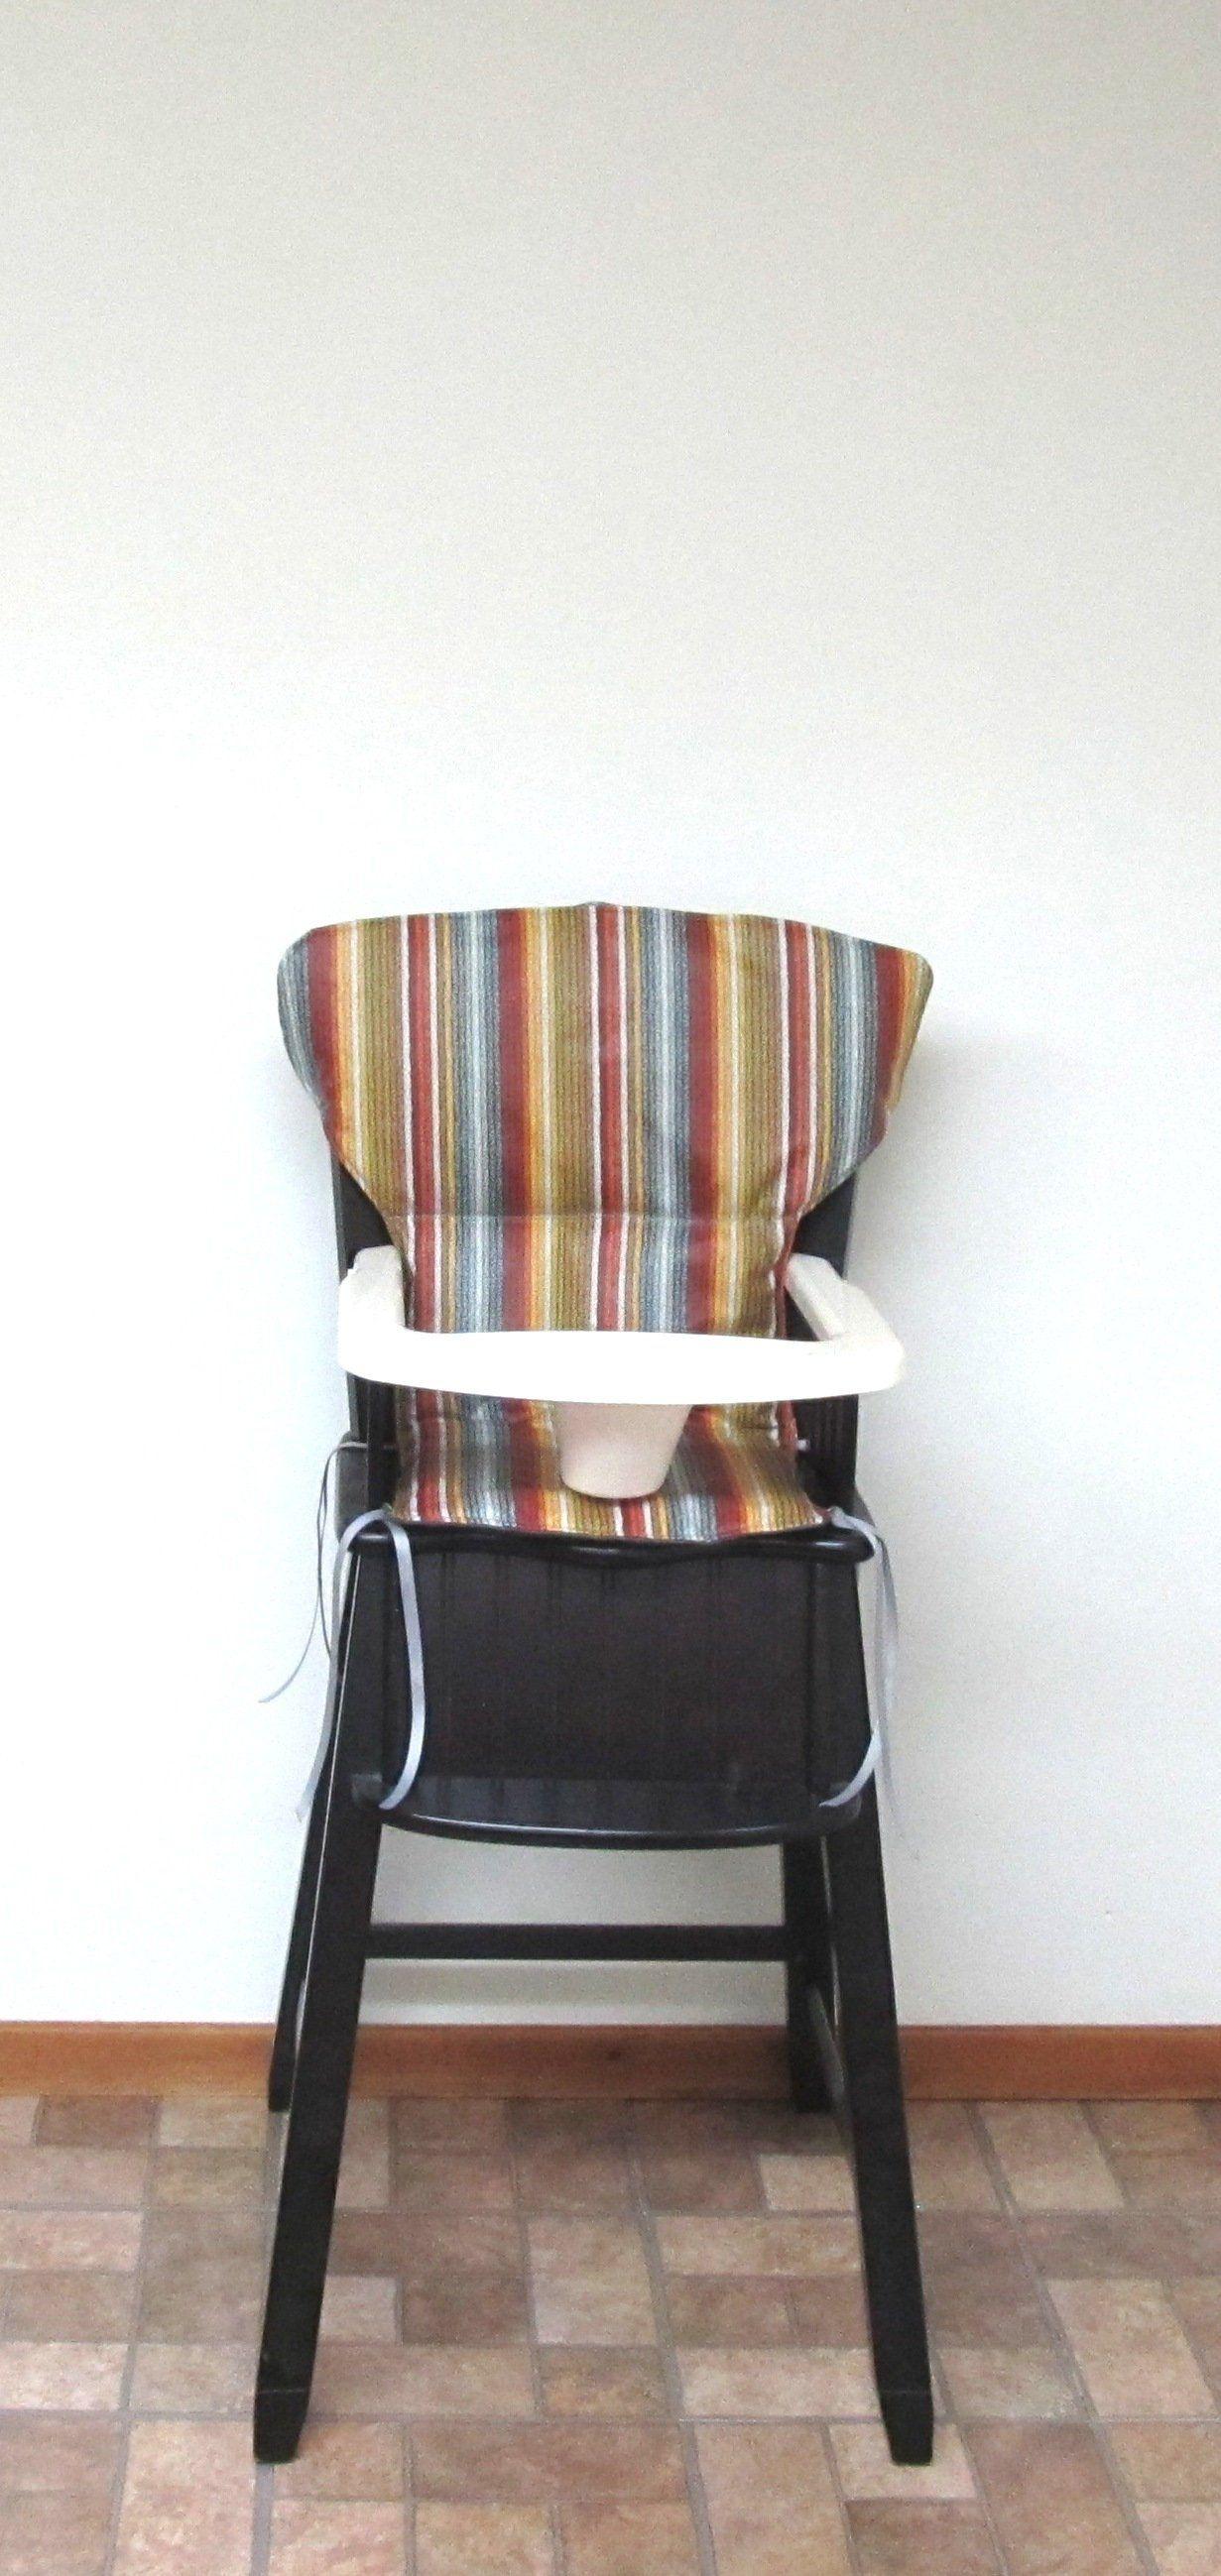 Eddie Bauer Newport LAMINATED cotton high chair cover